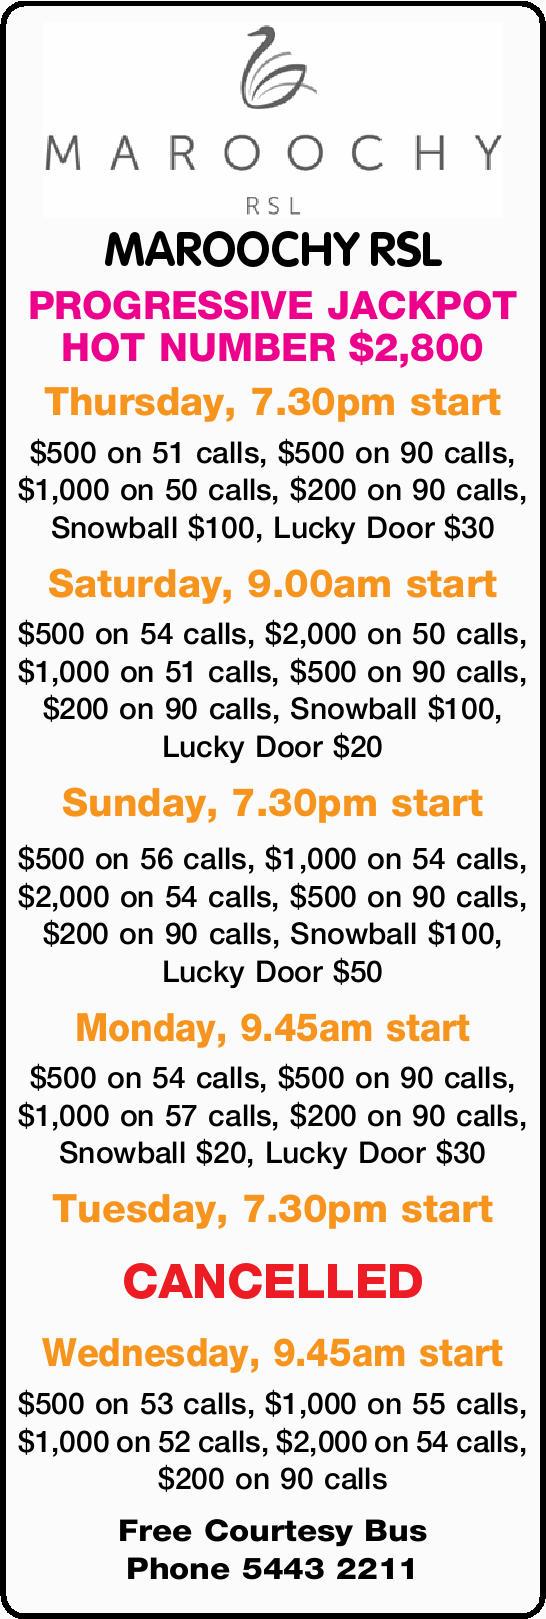 MAROOCHY RSL PROGRESSIVE JACKPOT HOT NUMBER $2,800 Thursday, 7.30pm start $500 on 51 calls, $500...